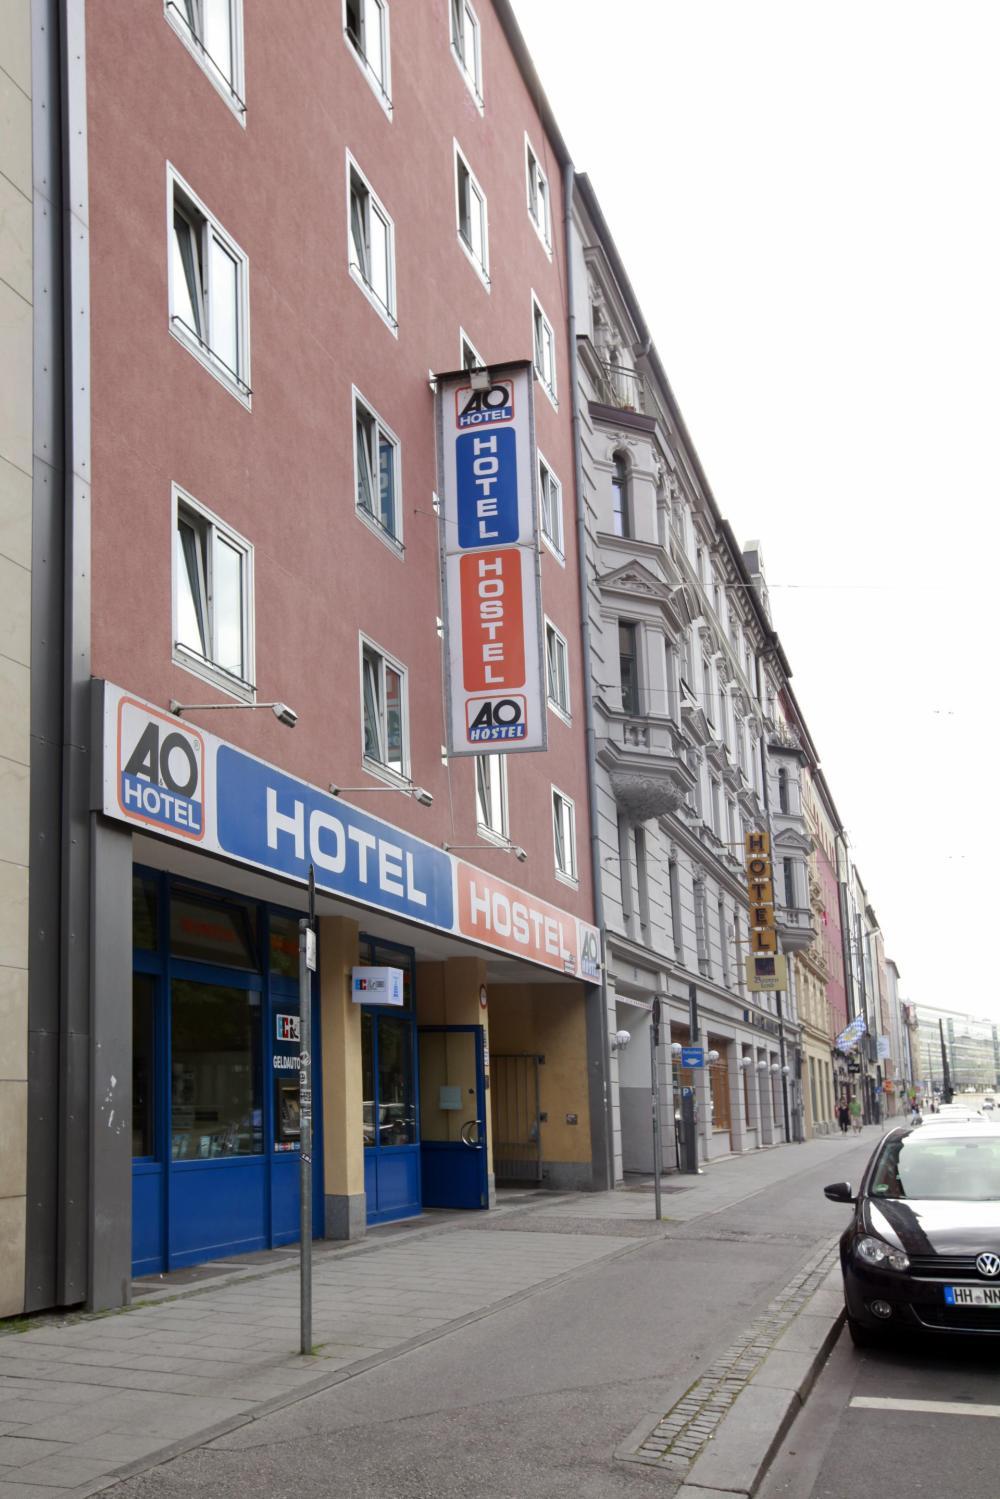 A&O München Hauptbahnhof Hostel Fassade